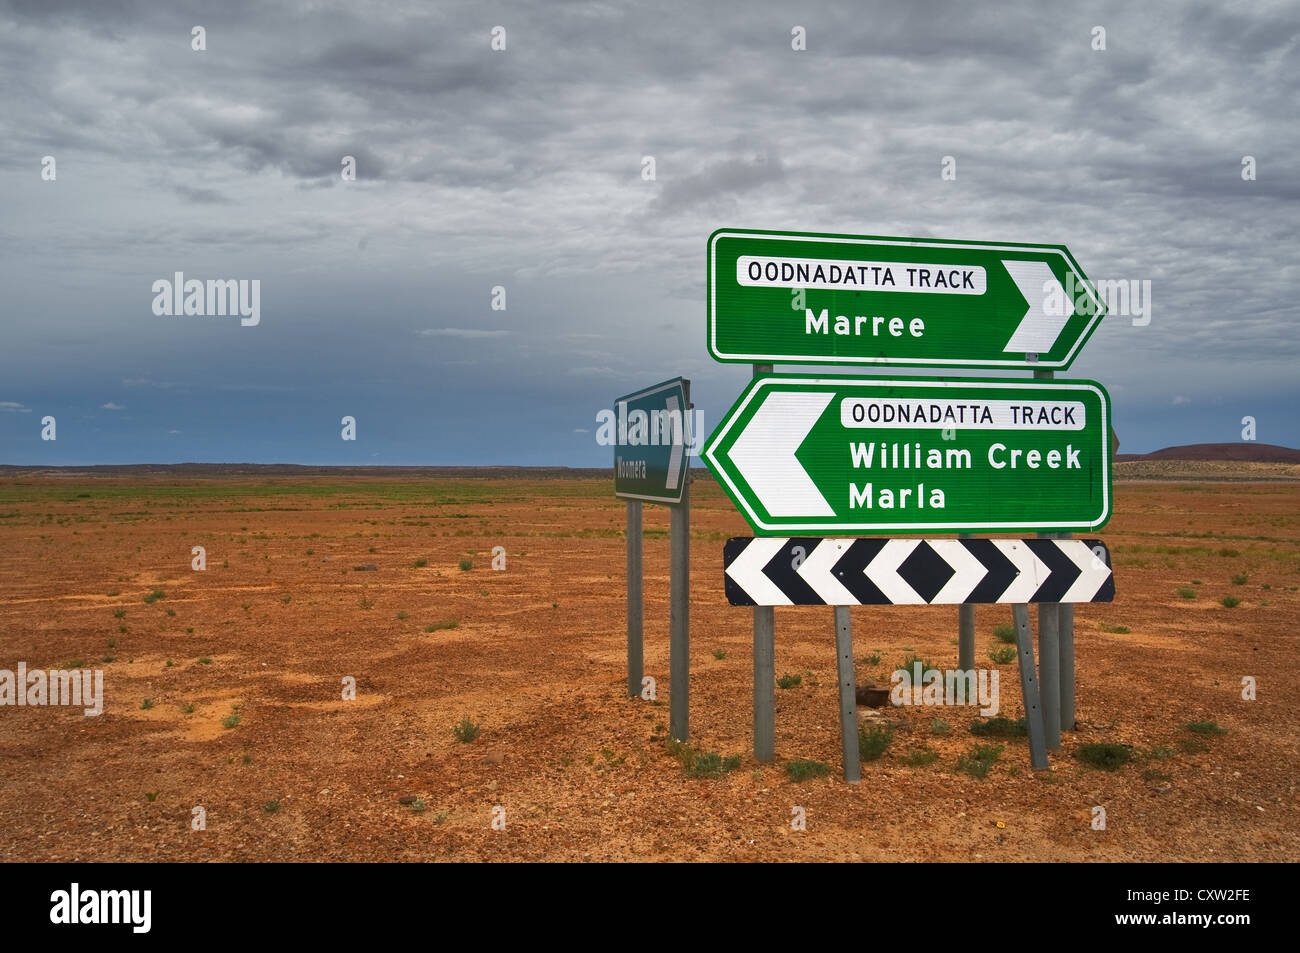 Straßenschild an der berühmten Oodnadatta Track in South Australia Wüste. Stockbild